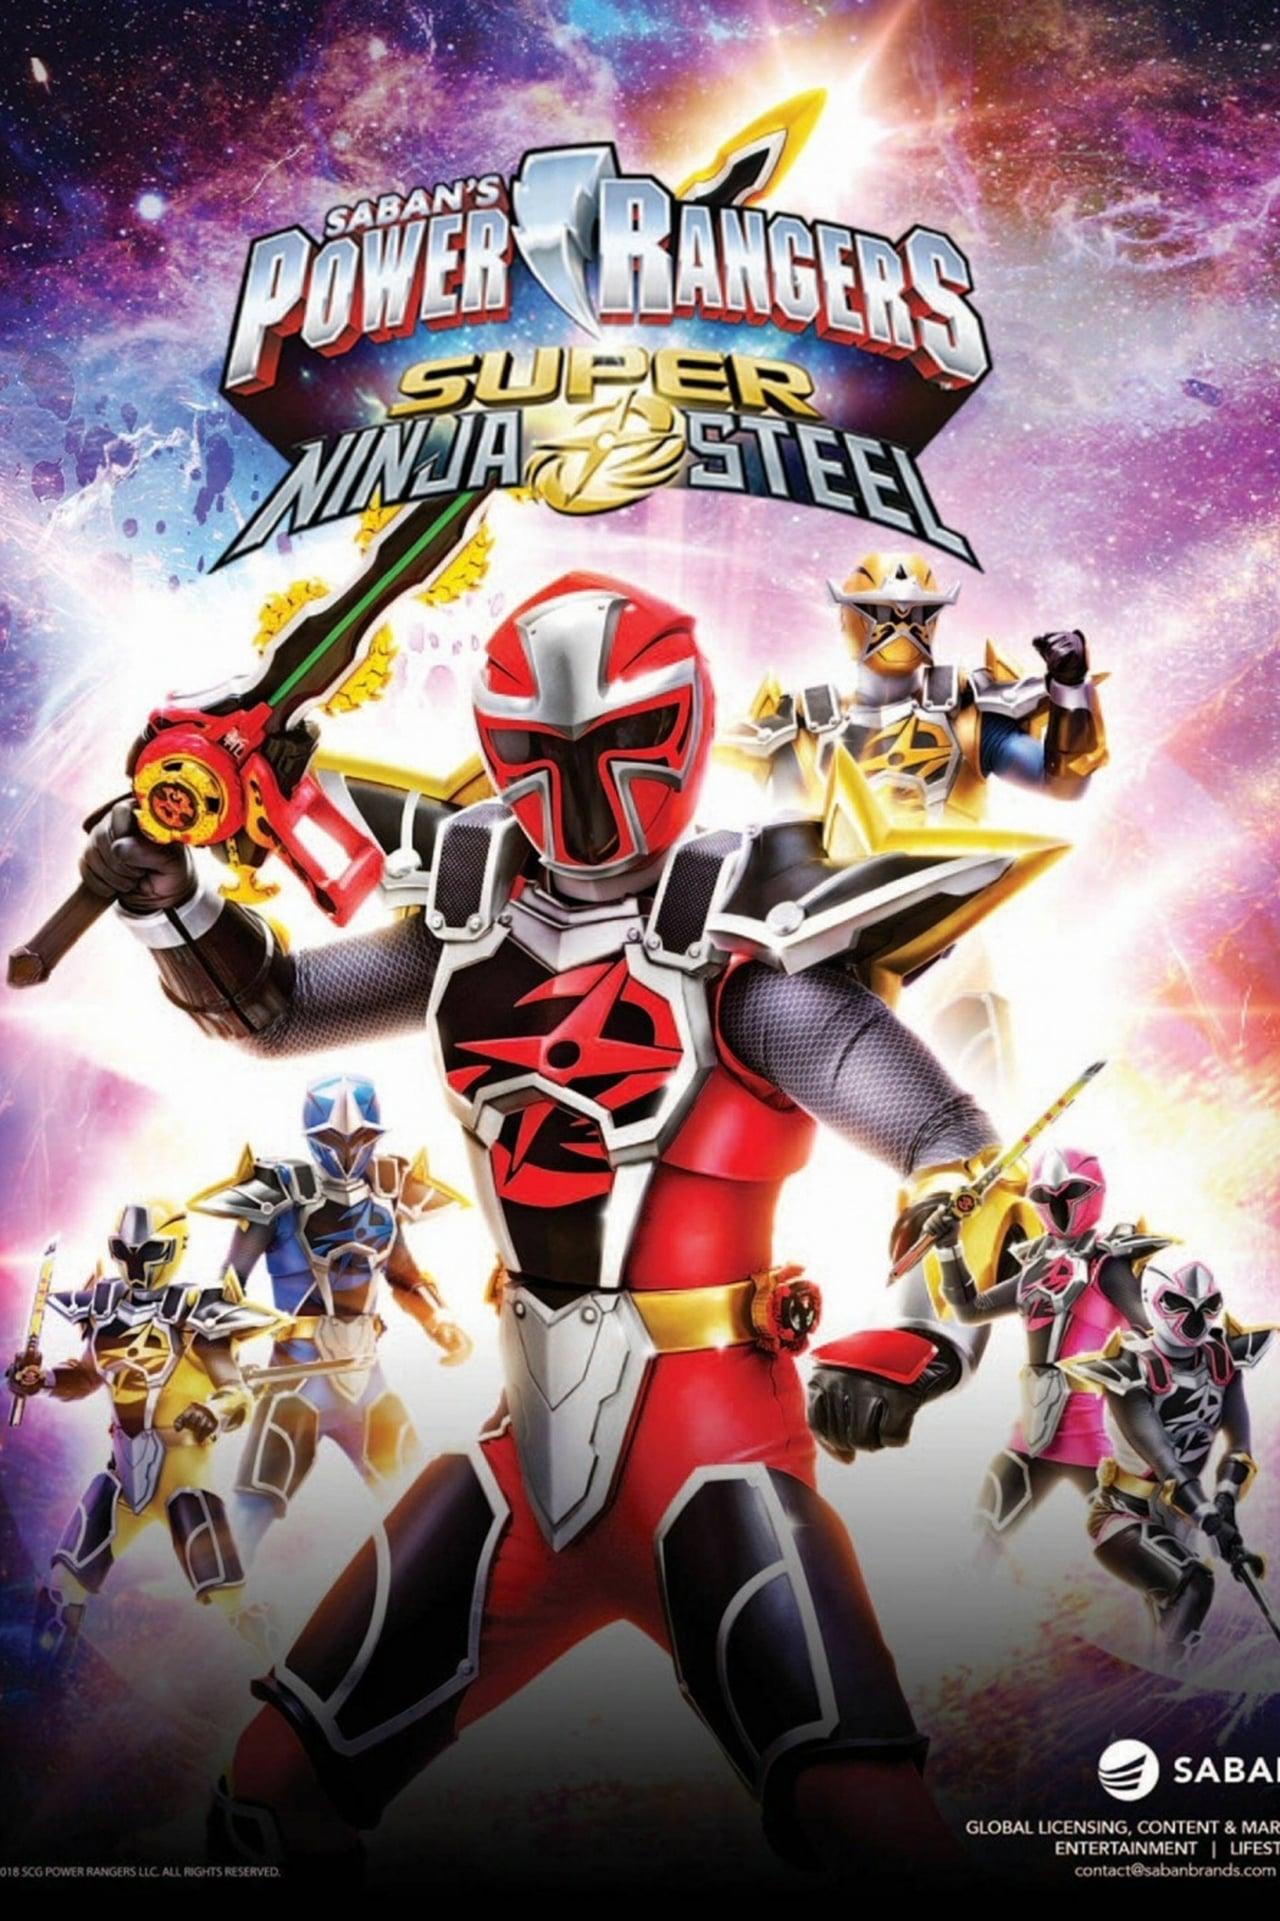 Power Rangers Season 25 (2018) putlockers cafe